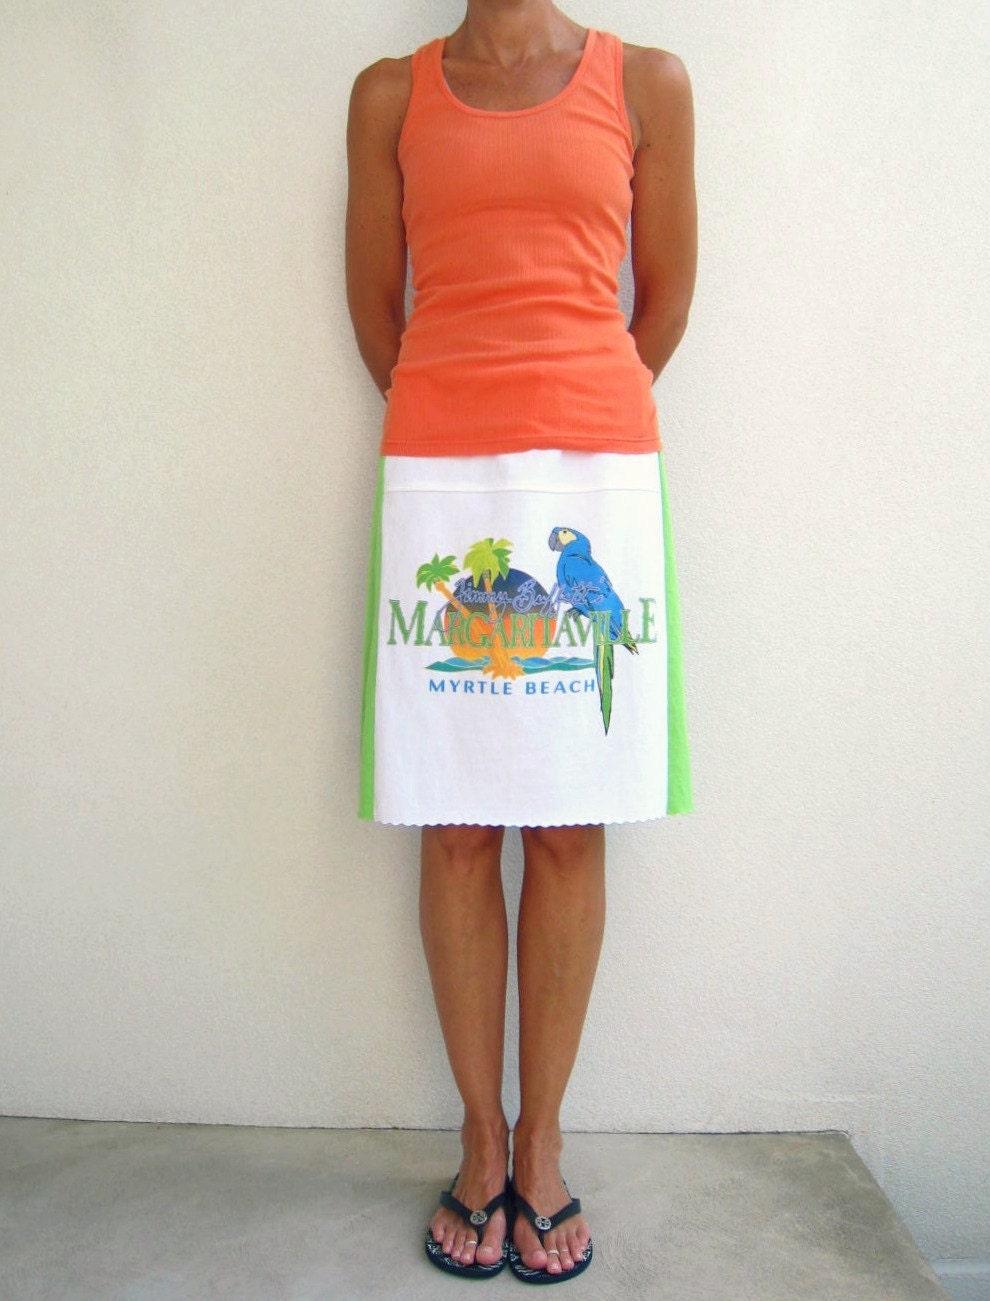 Jimmy Buffett T Shirt Skirt / White Green Periwinkle Blue / Margaritaville / Drawstring / Cotton / Soft / Fun / Beach / Vacation / ohzie - ohzie